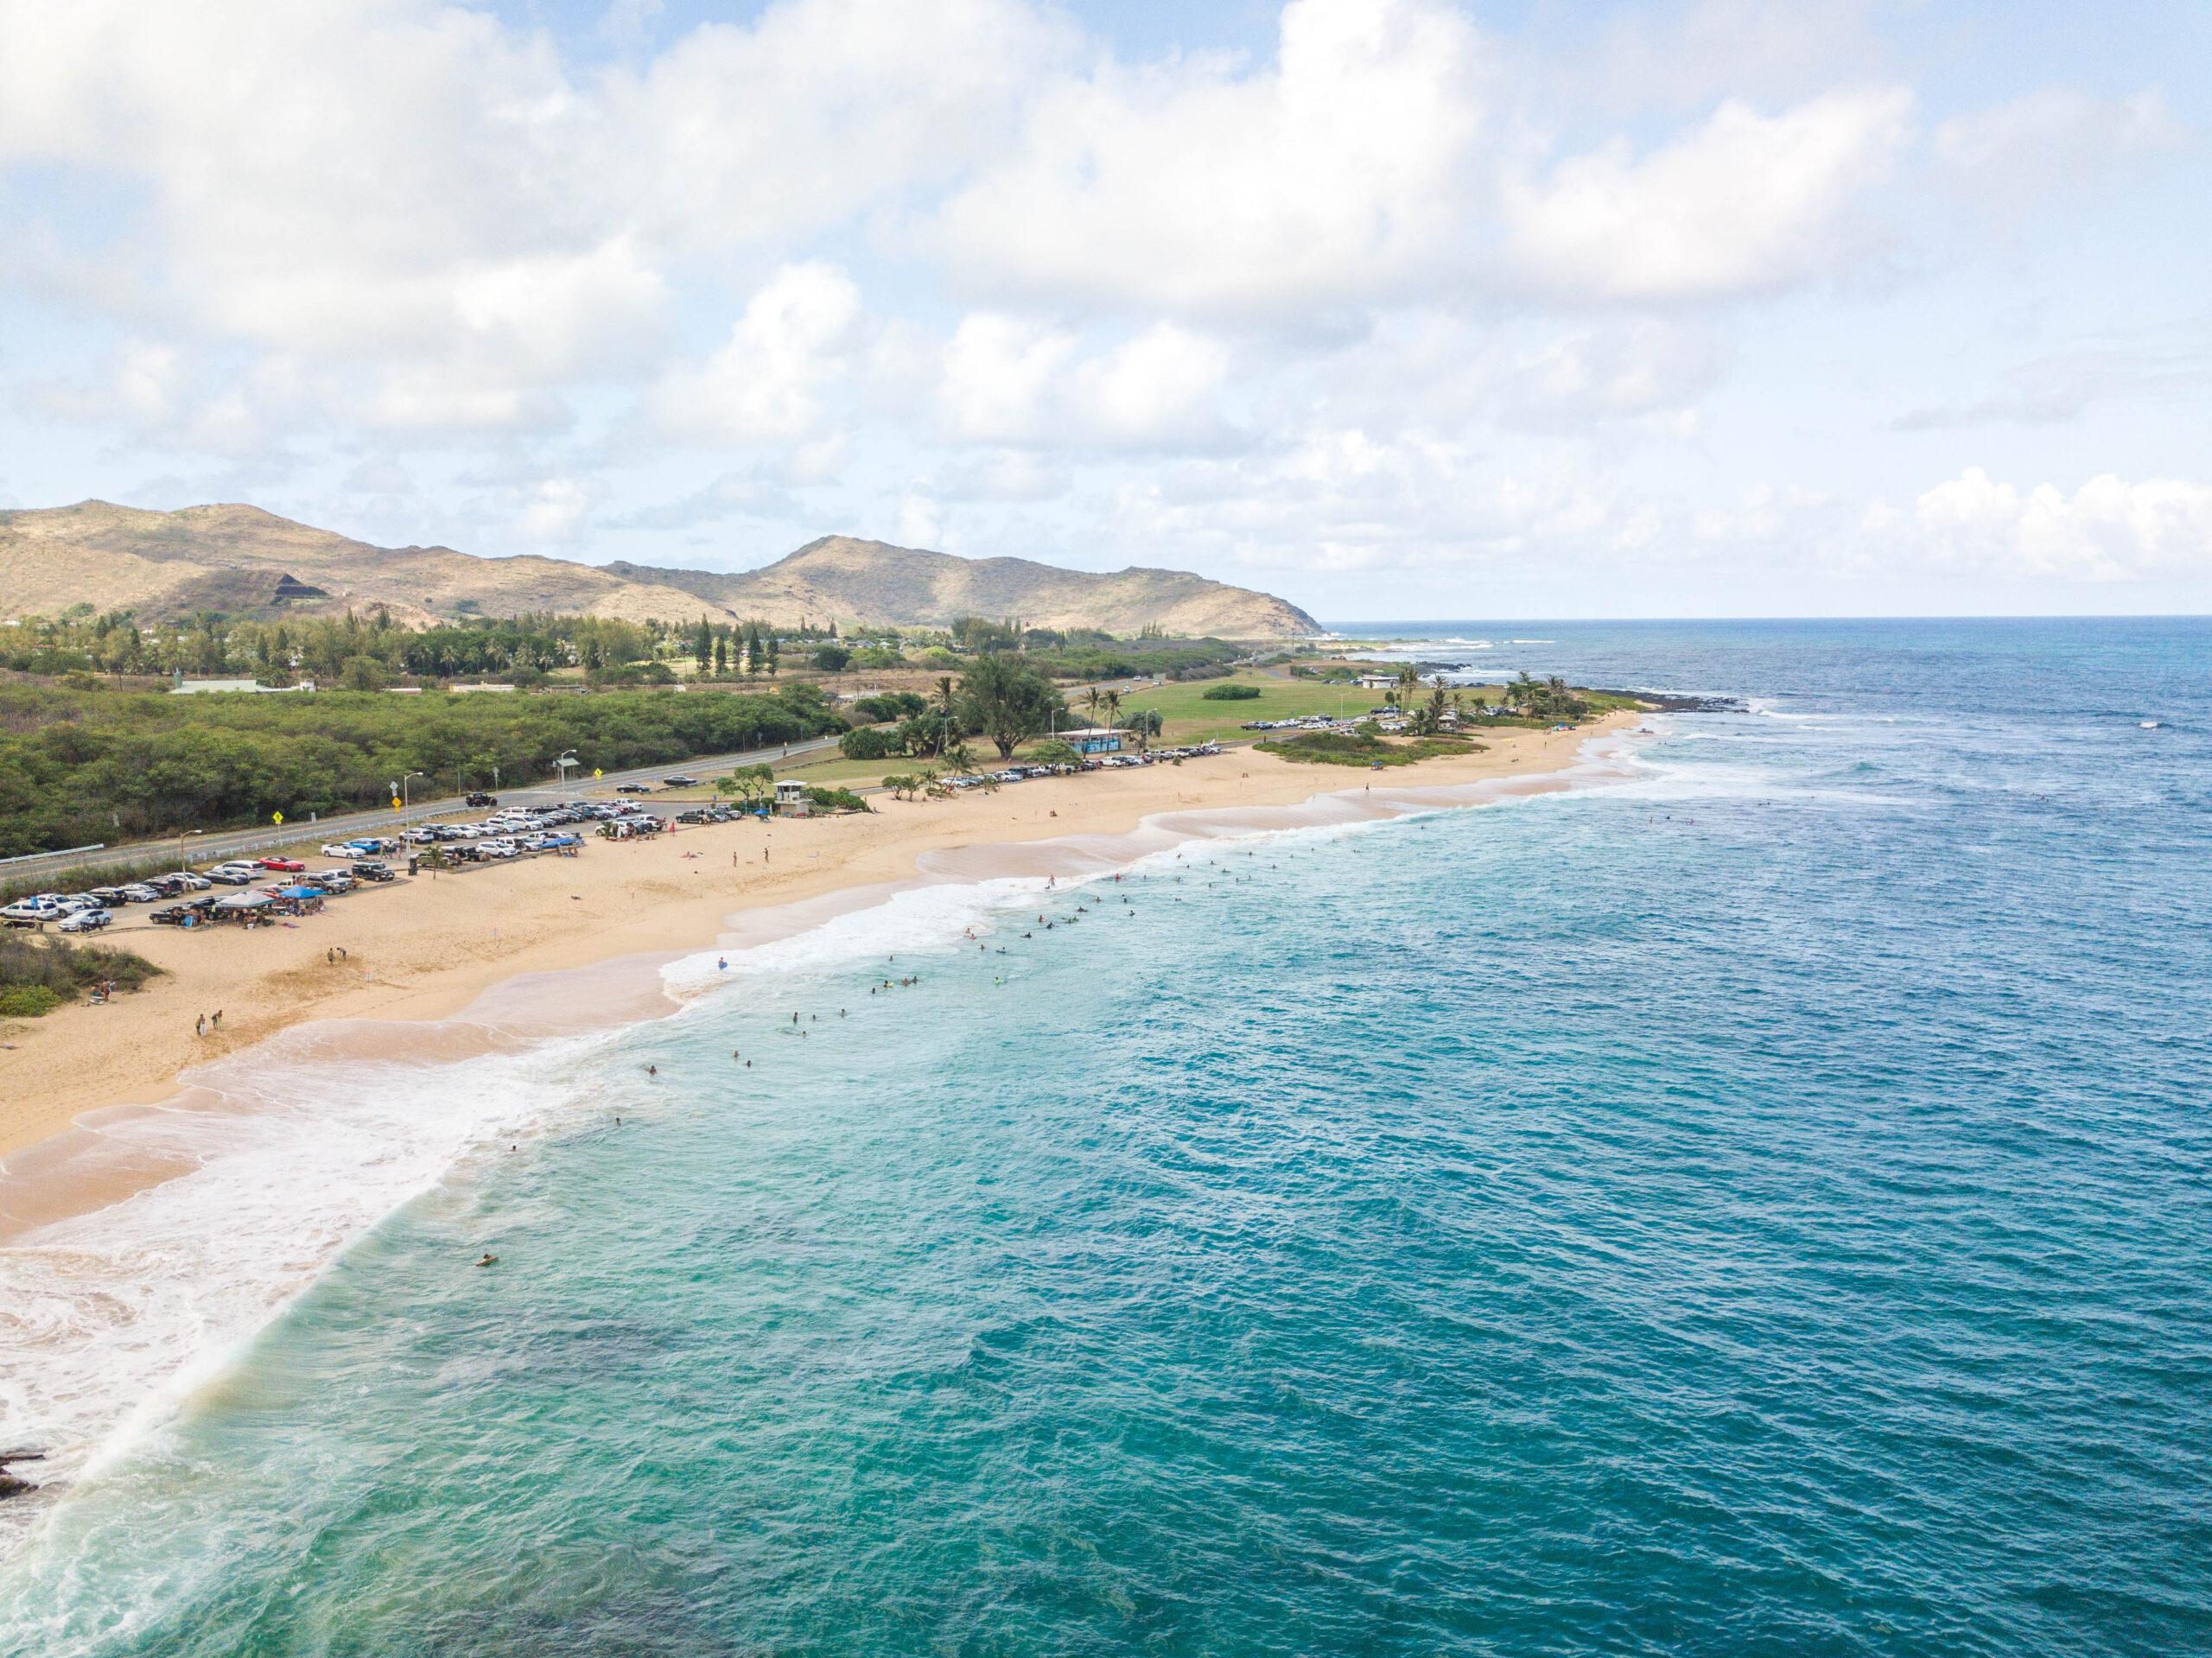 Birds-eye-view of Oahu coastline